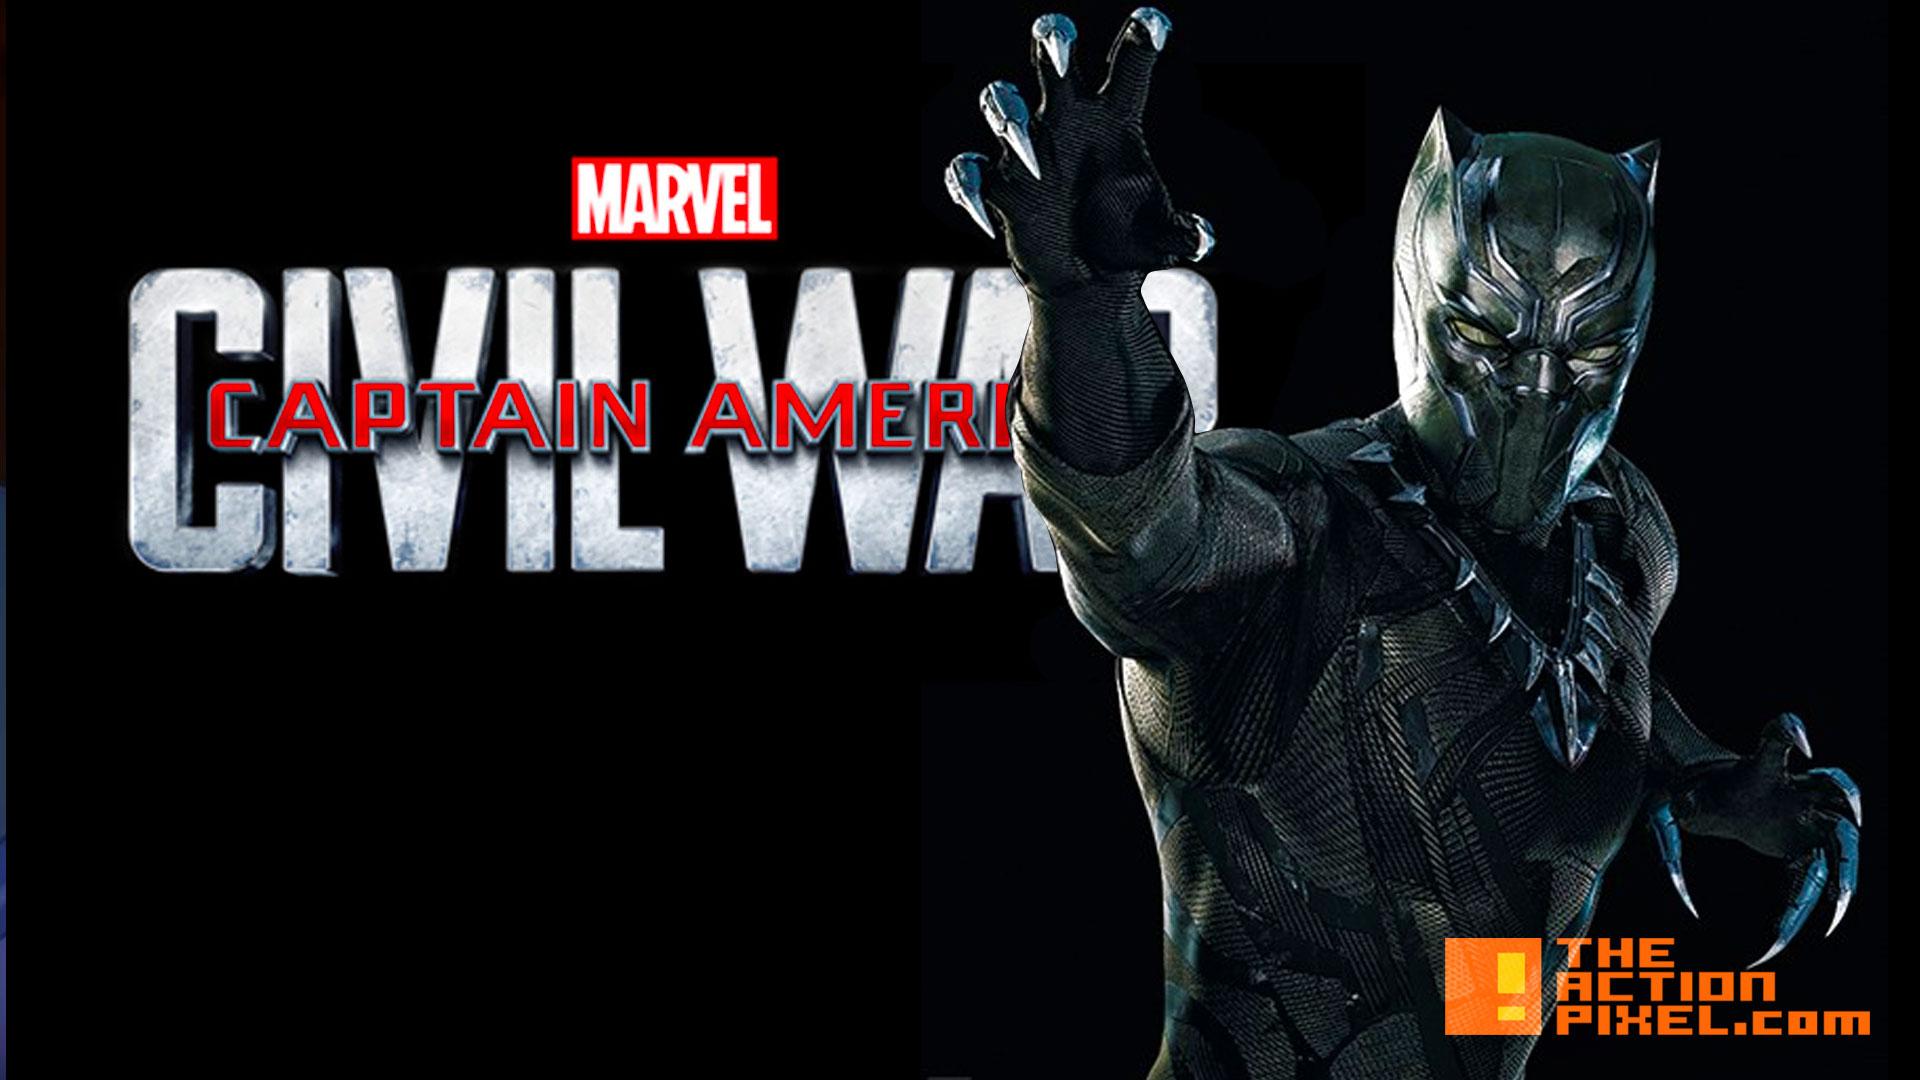 black panther. captain america: civil war. theactionpixel. @theactionpixel